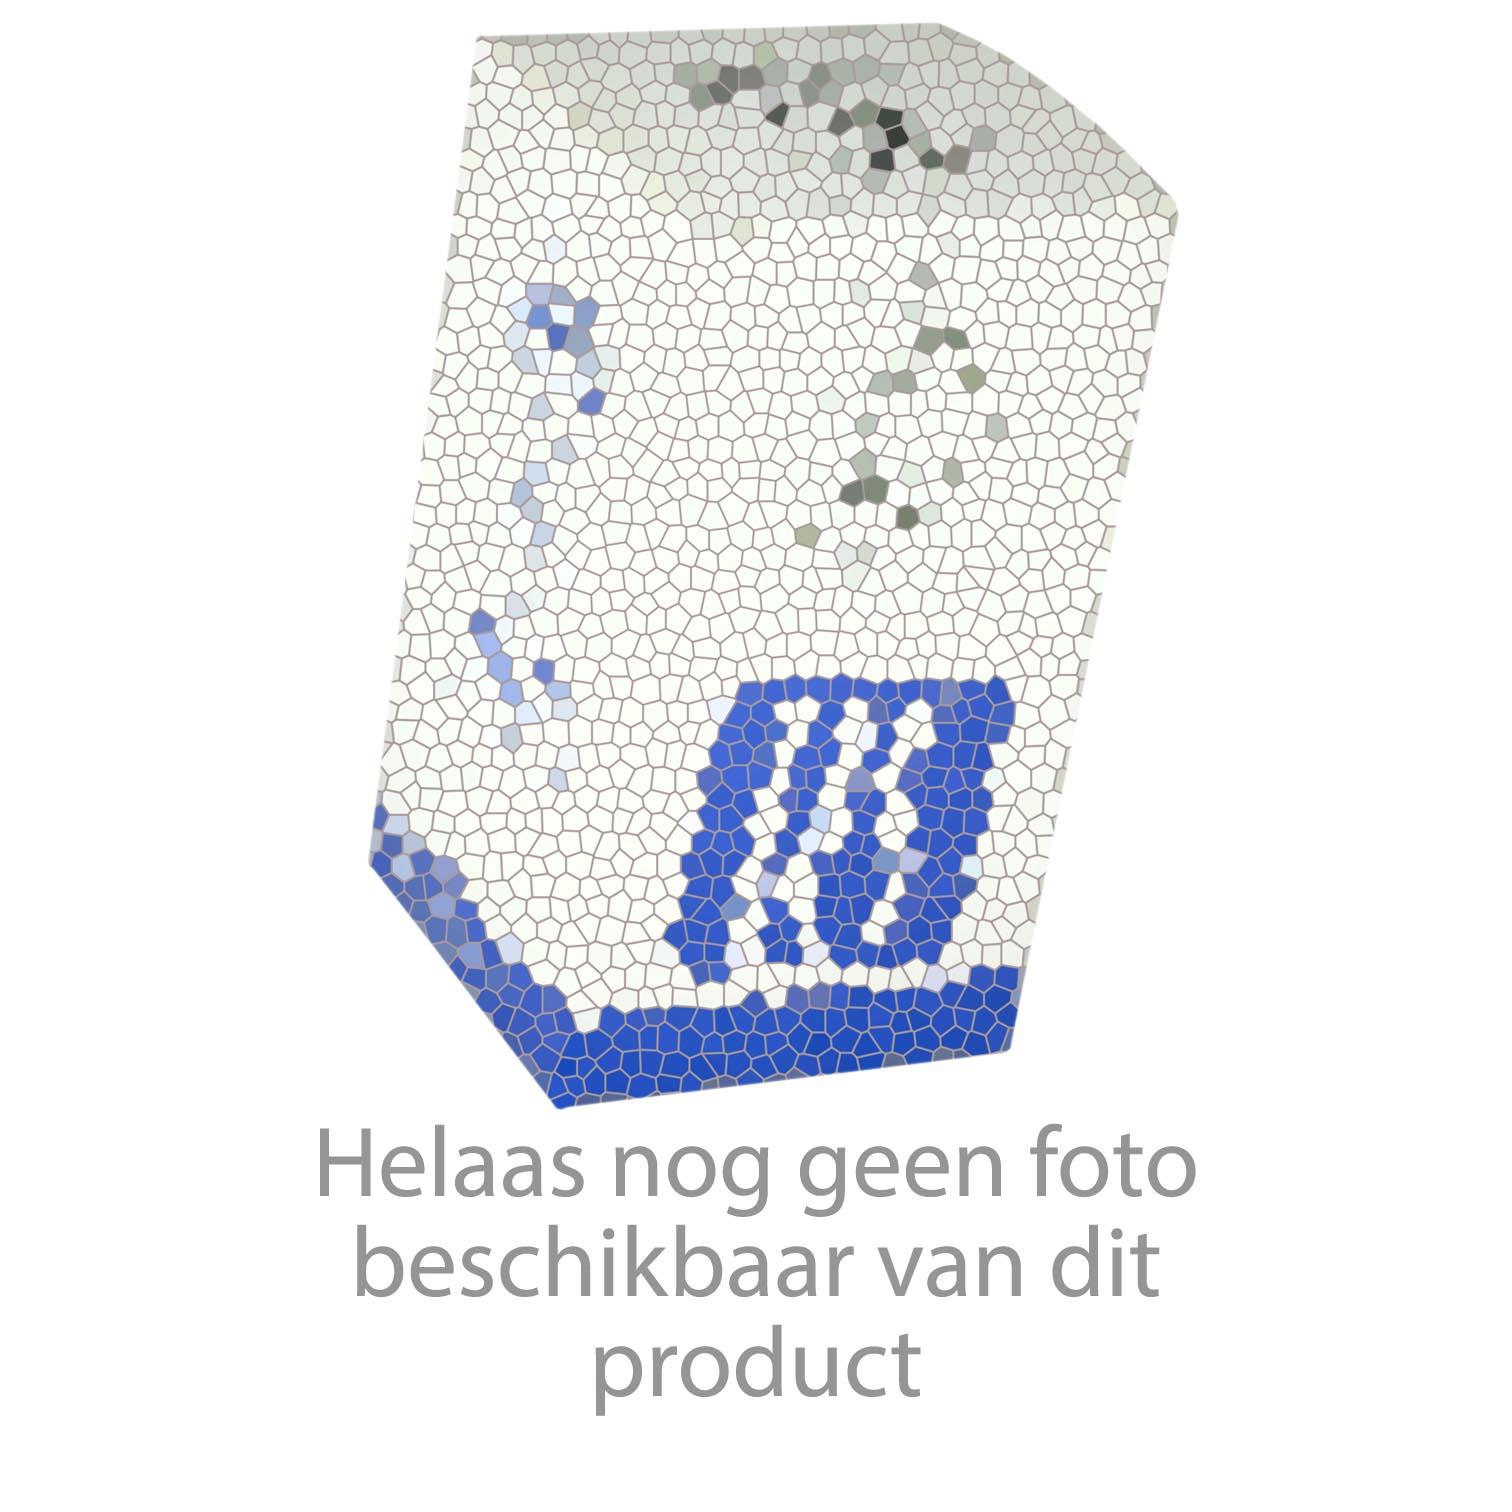 Bekend Grohe Thermostaat Cartouche tbv omgekeerde werking (warm rechts PV63